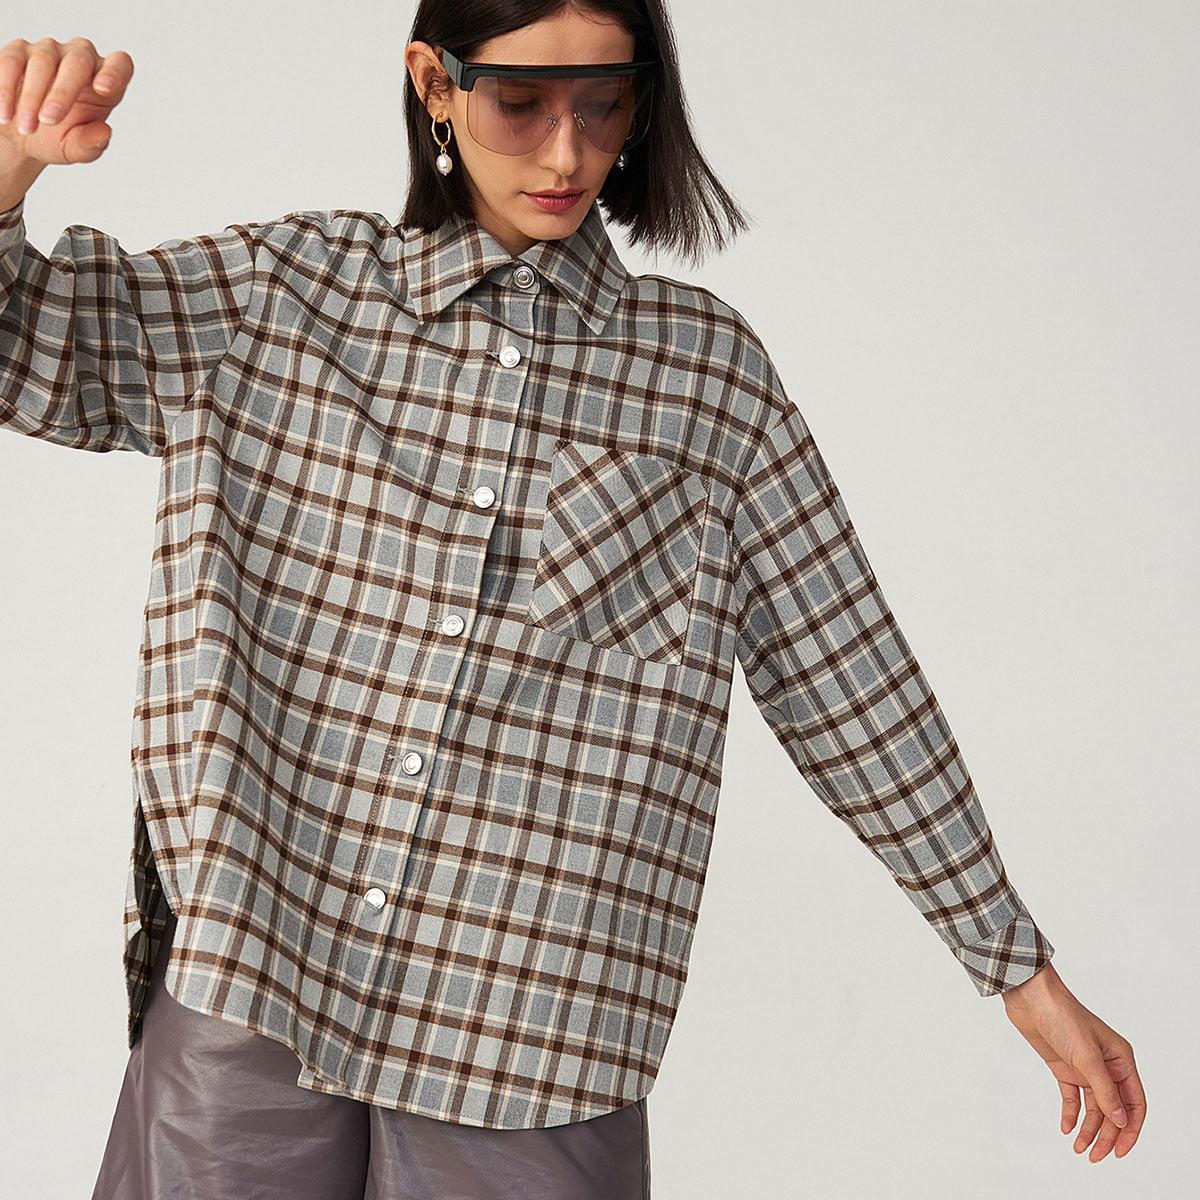 Рубашка оверсайз в клетку с карманом